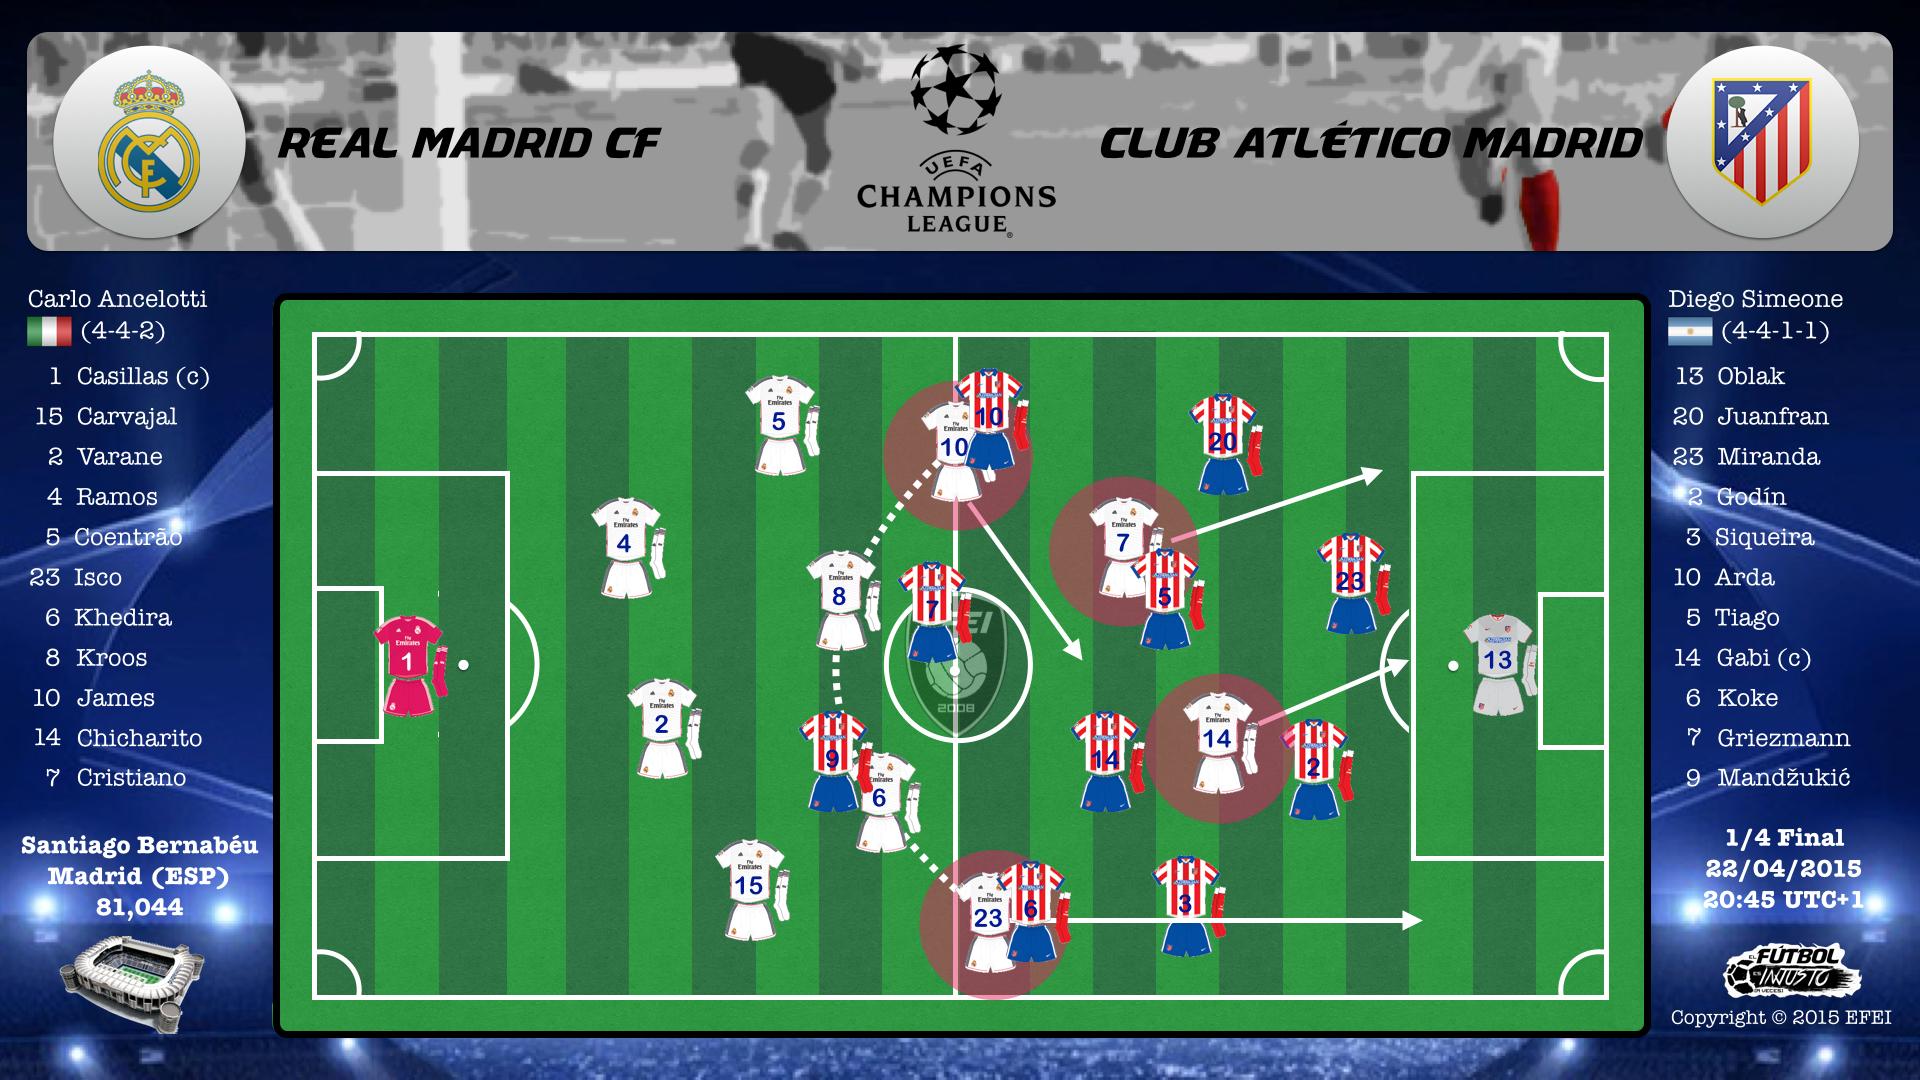 UEFA Champions League Real Madrid Atletico Tactica 4-4-2